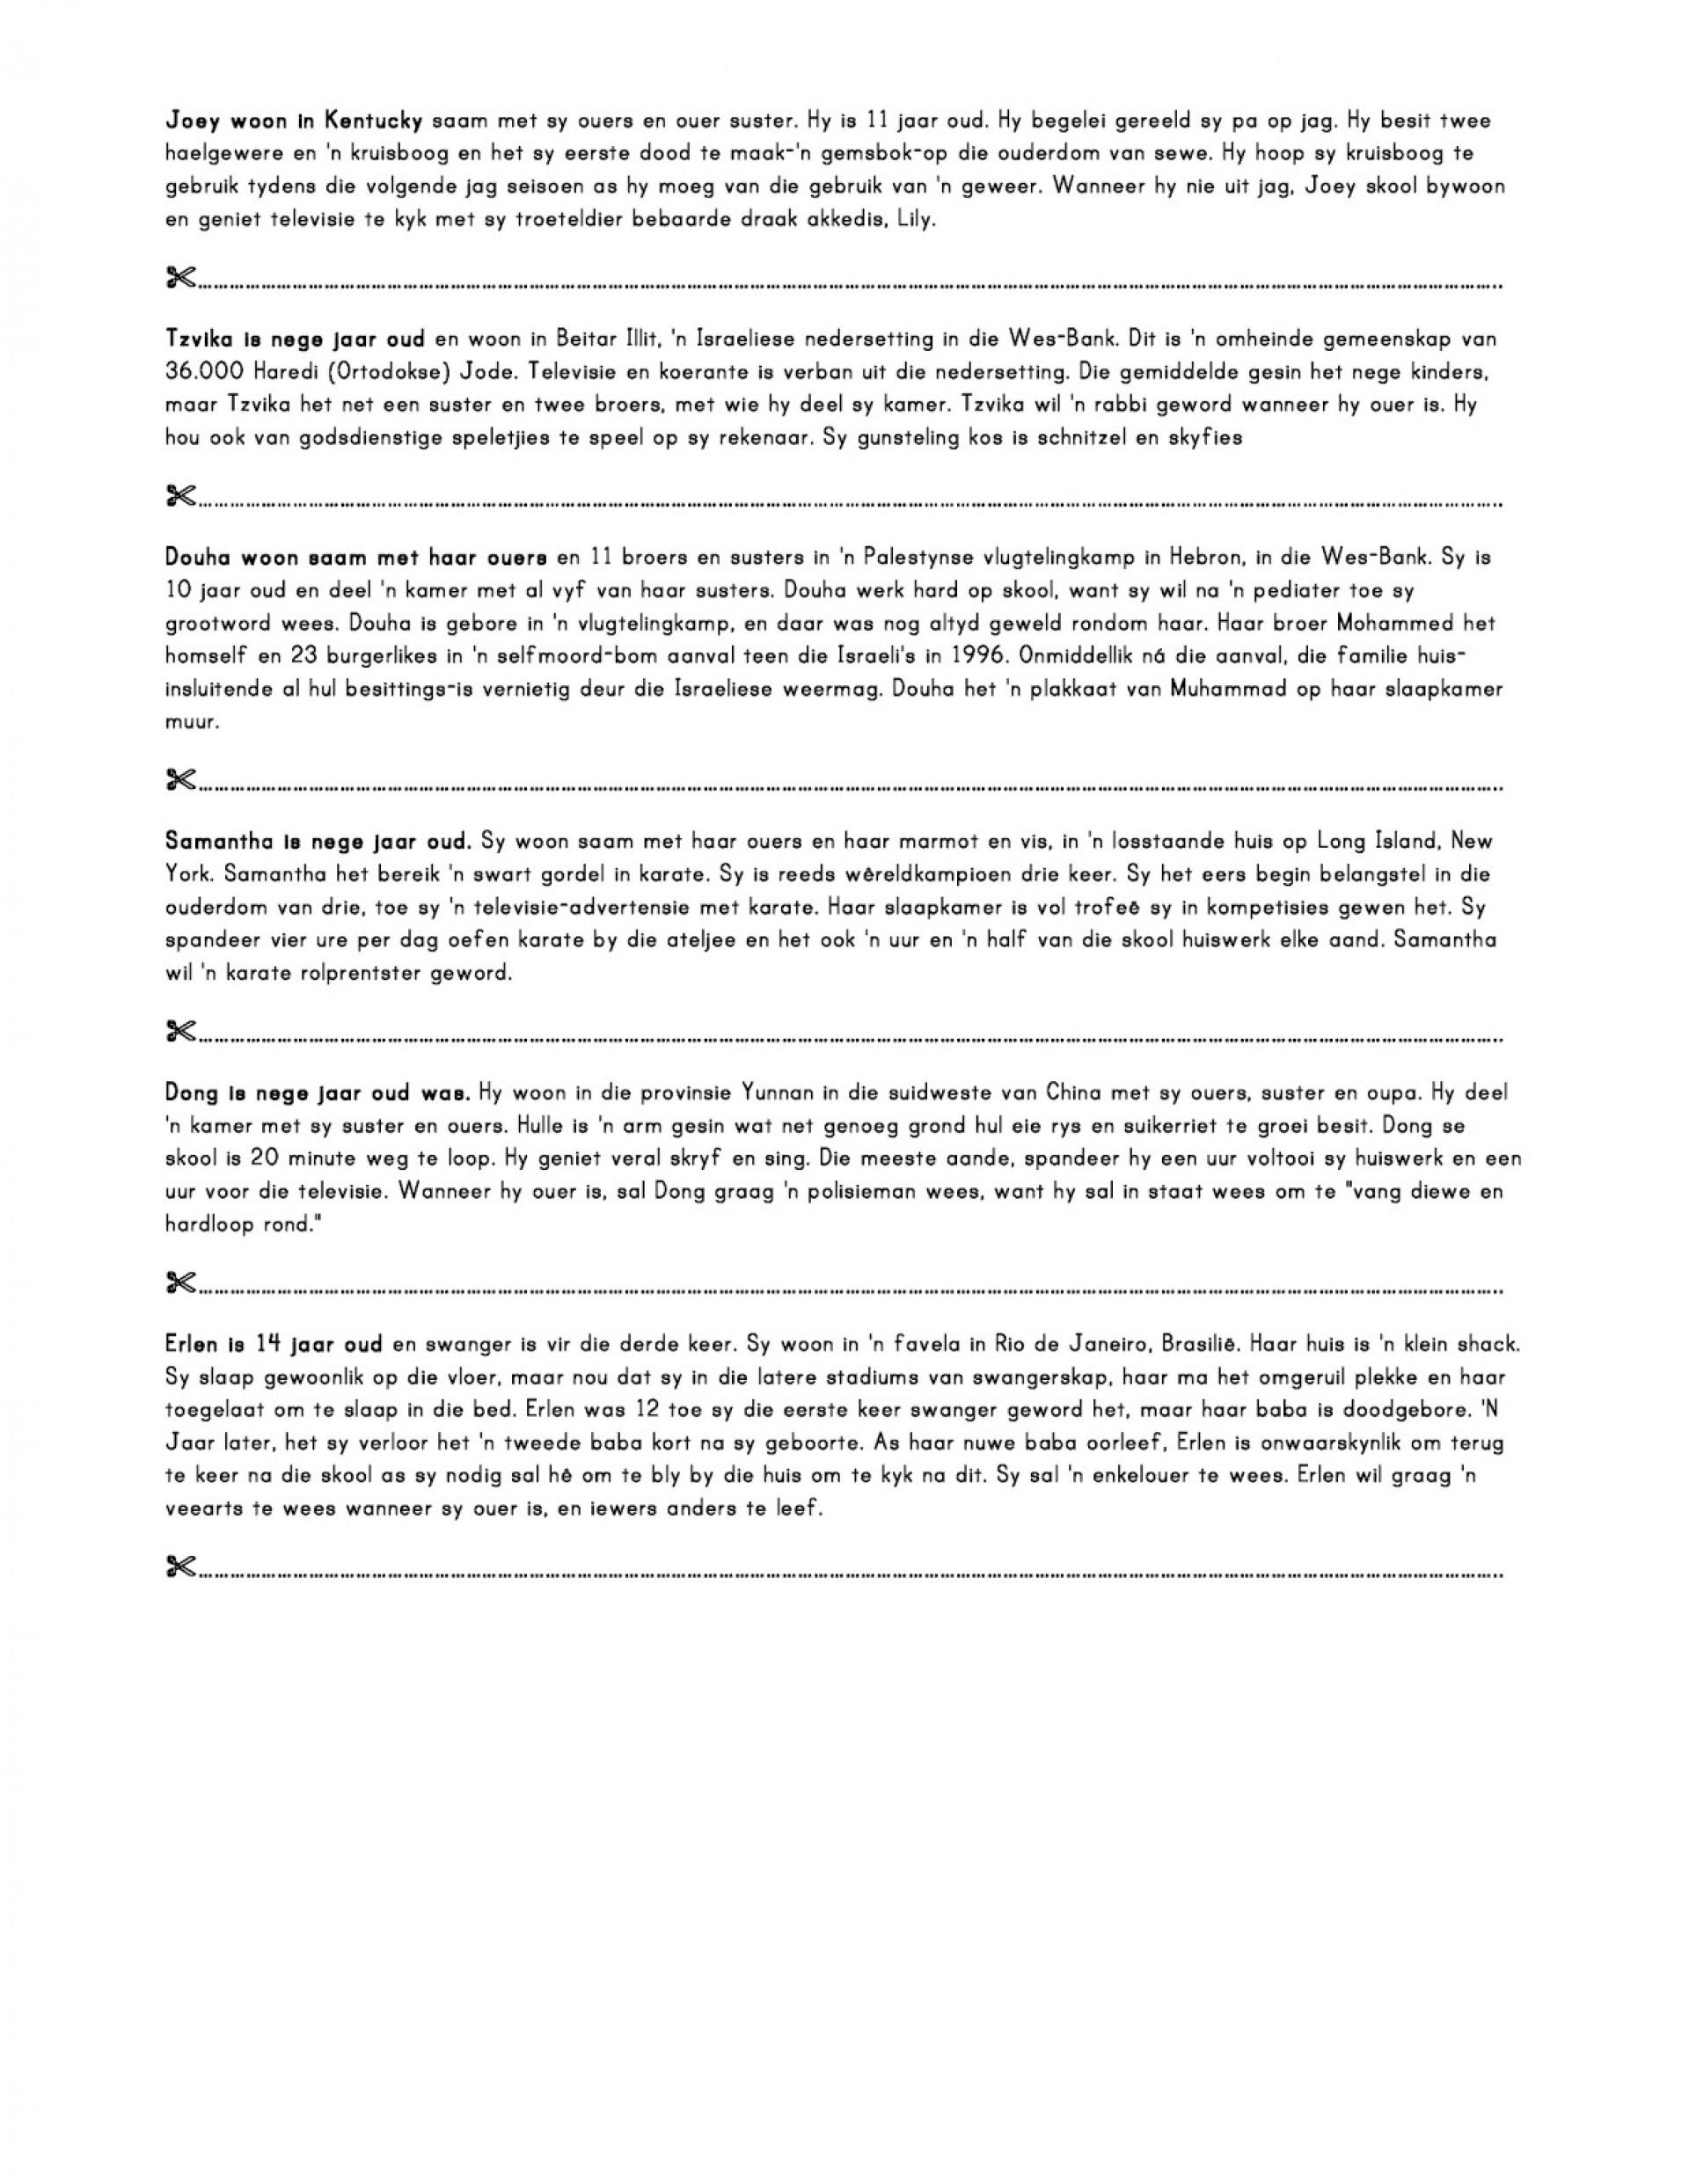 018 My School Essay Example Foto2btext Page Amazing Dream For Class 10 In Urdu 1 3 Marathi 1920